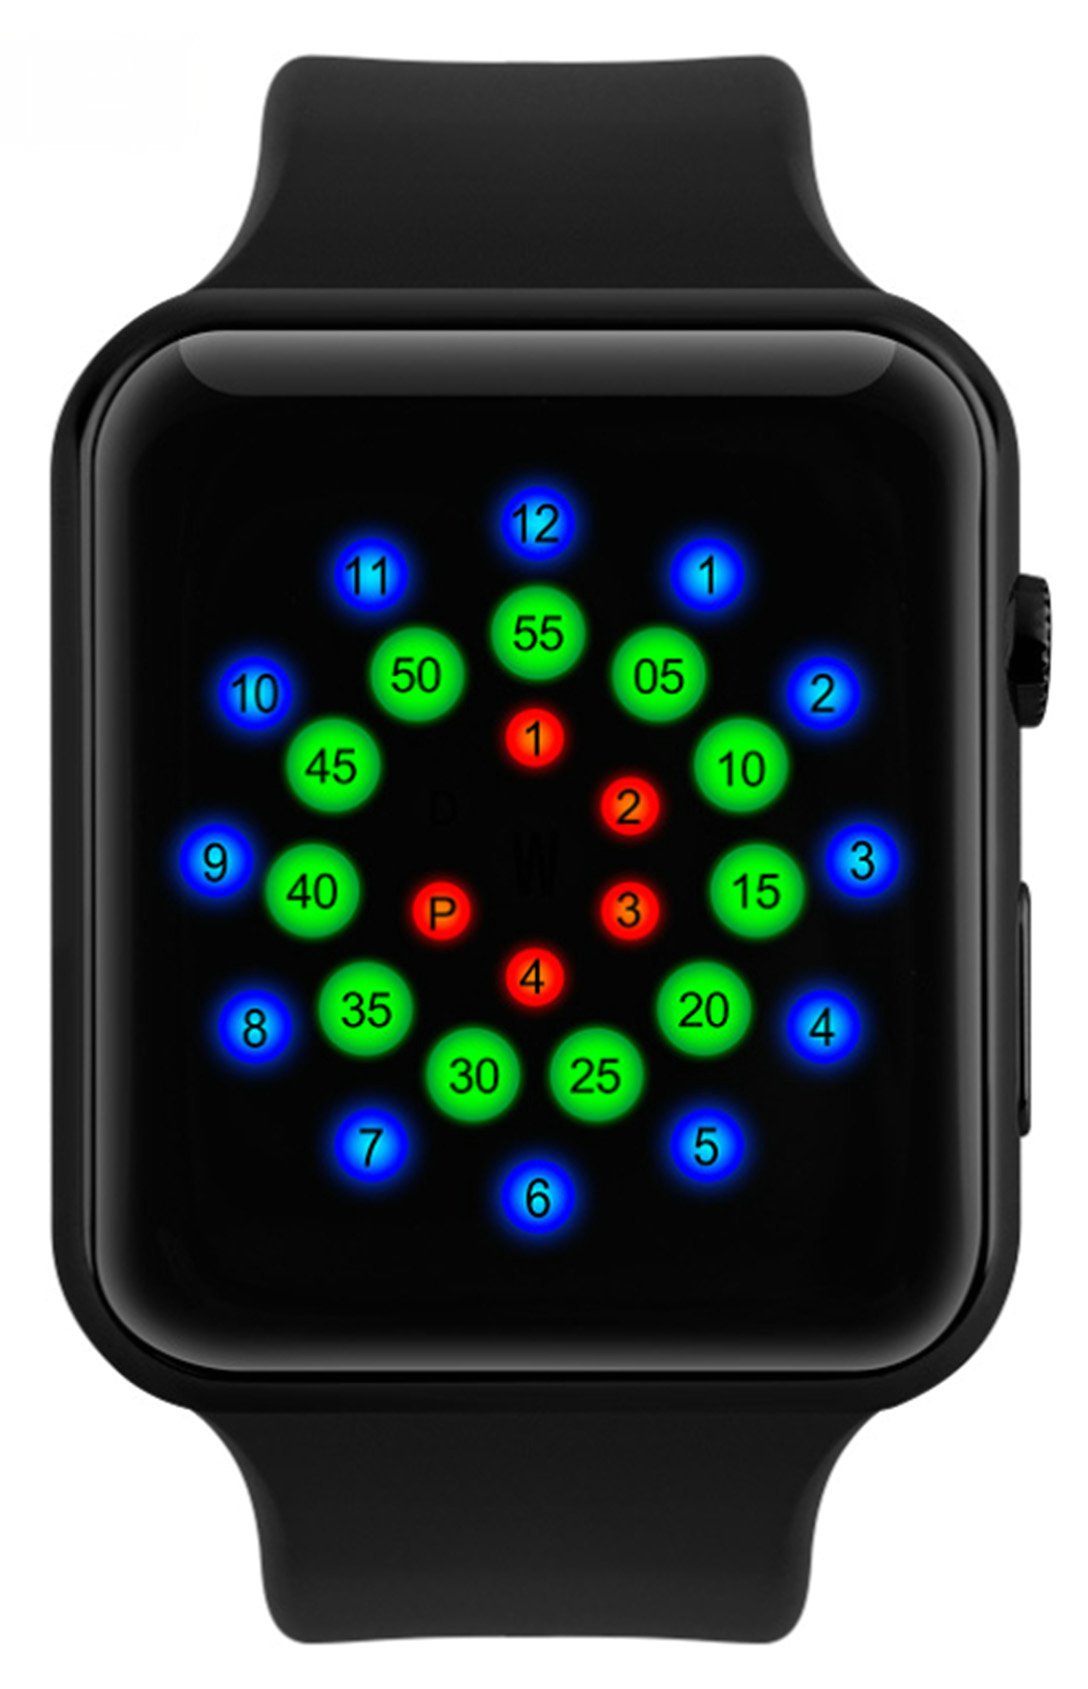 WUTONYU Unisex Digital LED Display Time Date Week Sports Waterproof PU Band Wrist Watch (Black)